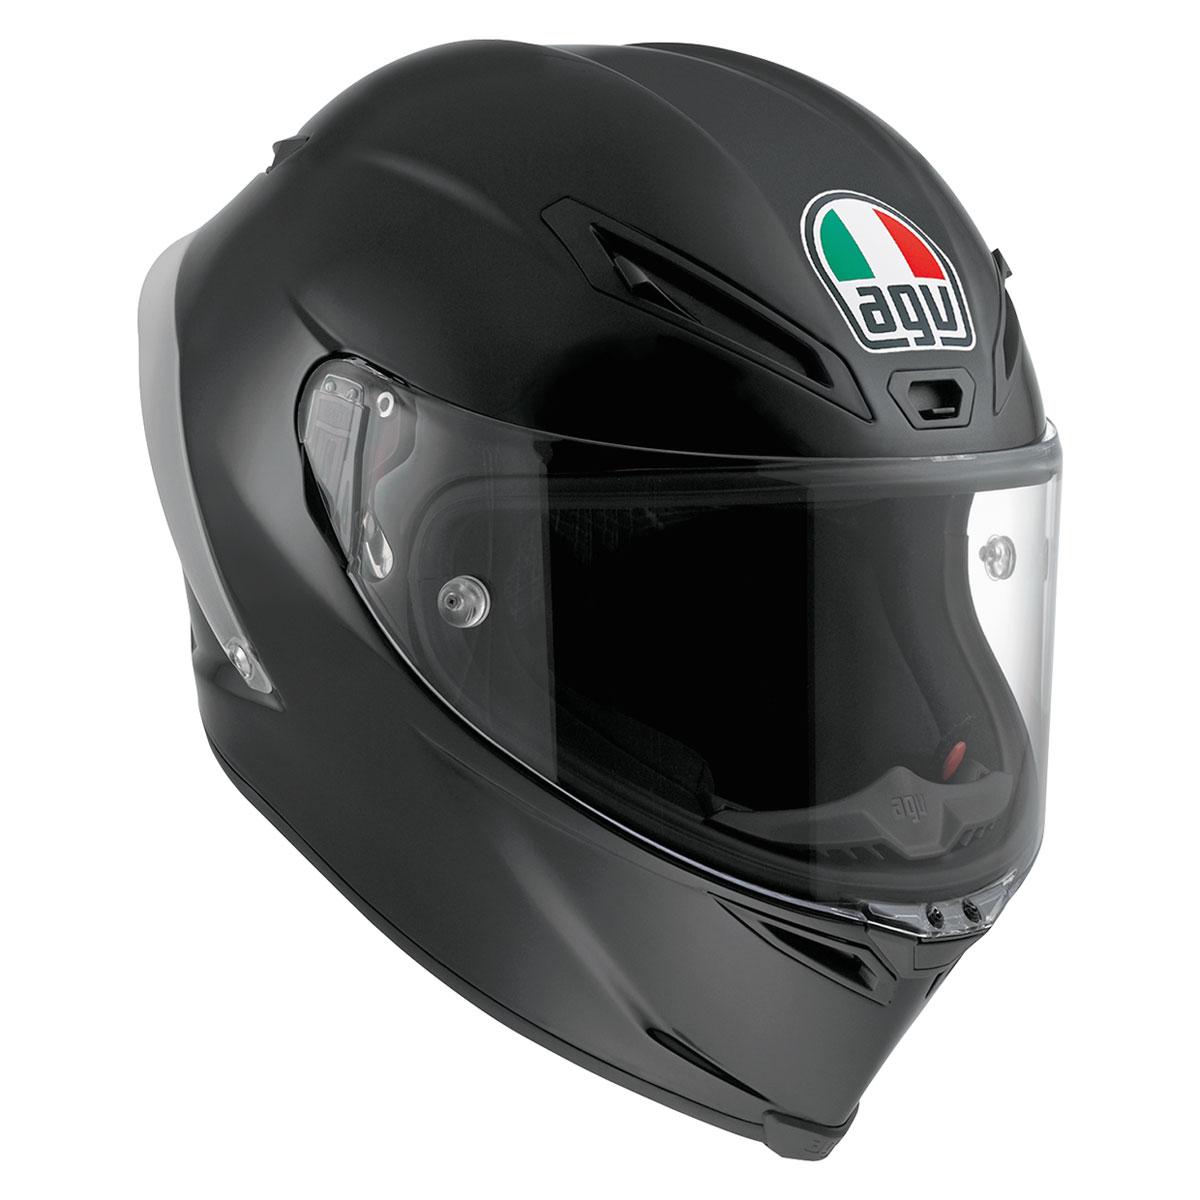 b1a2407a AGV Corsa R Matte Black Full Face Helmet - 6121O4HY002S | JPCycles.com